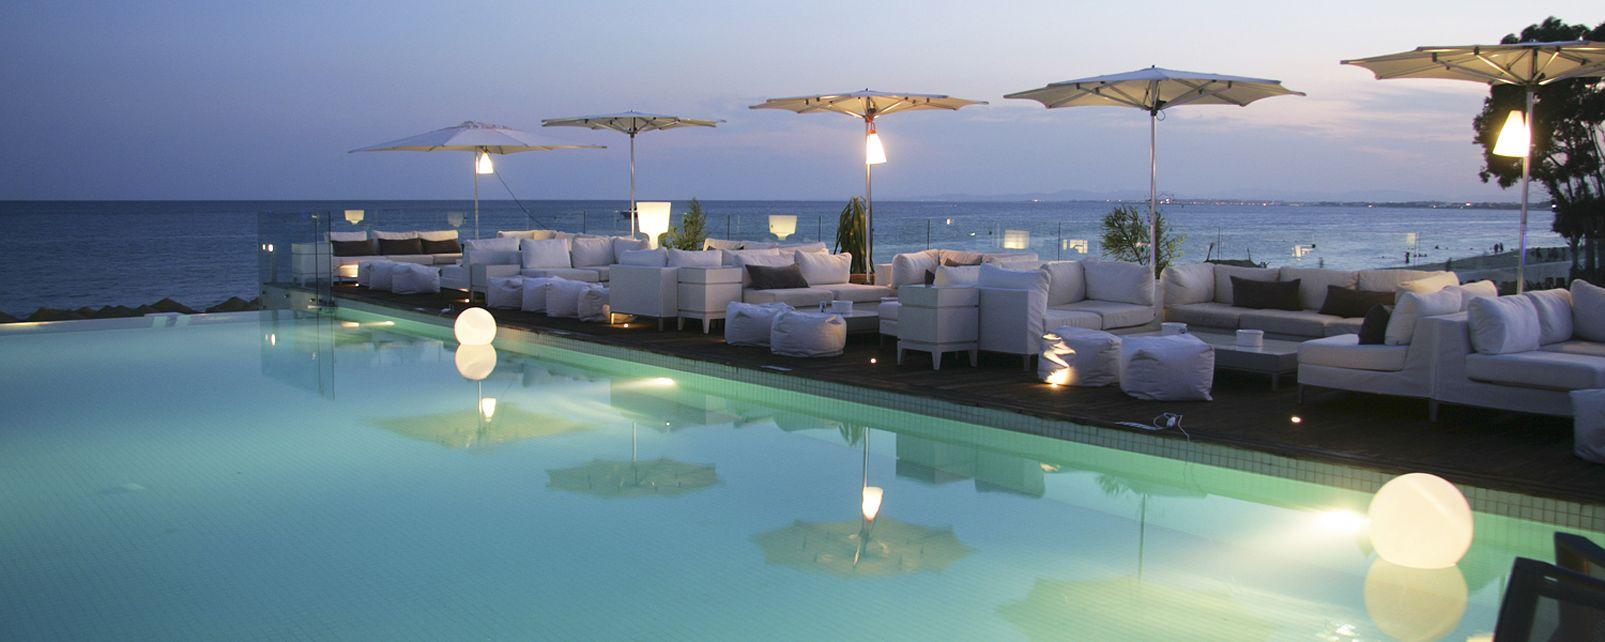 The Sindbad Hotel  Hammamet Tunesien